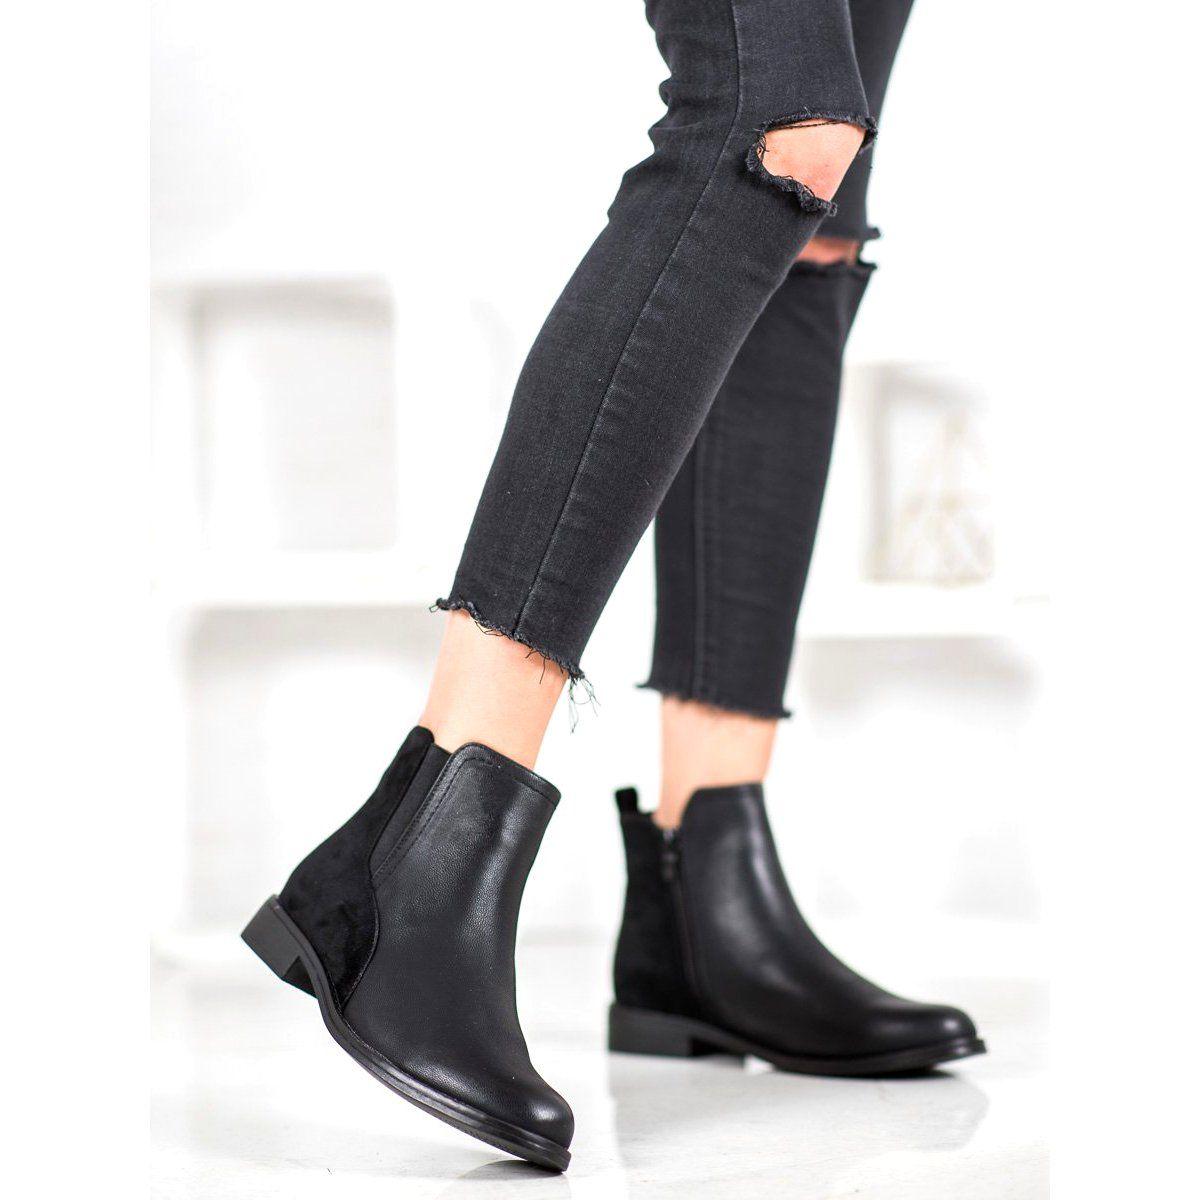 J Star Eleganckie Czarne Botki Shoes Ankle Boot Boots